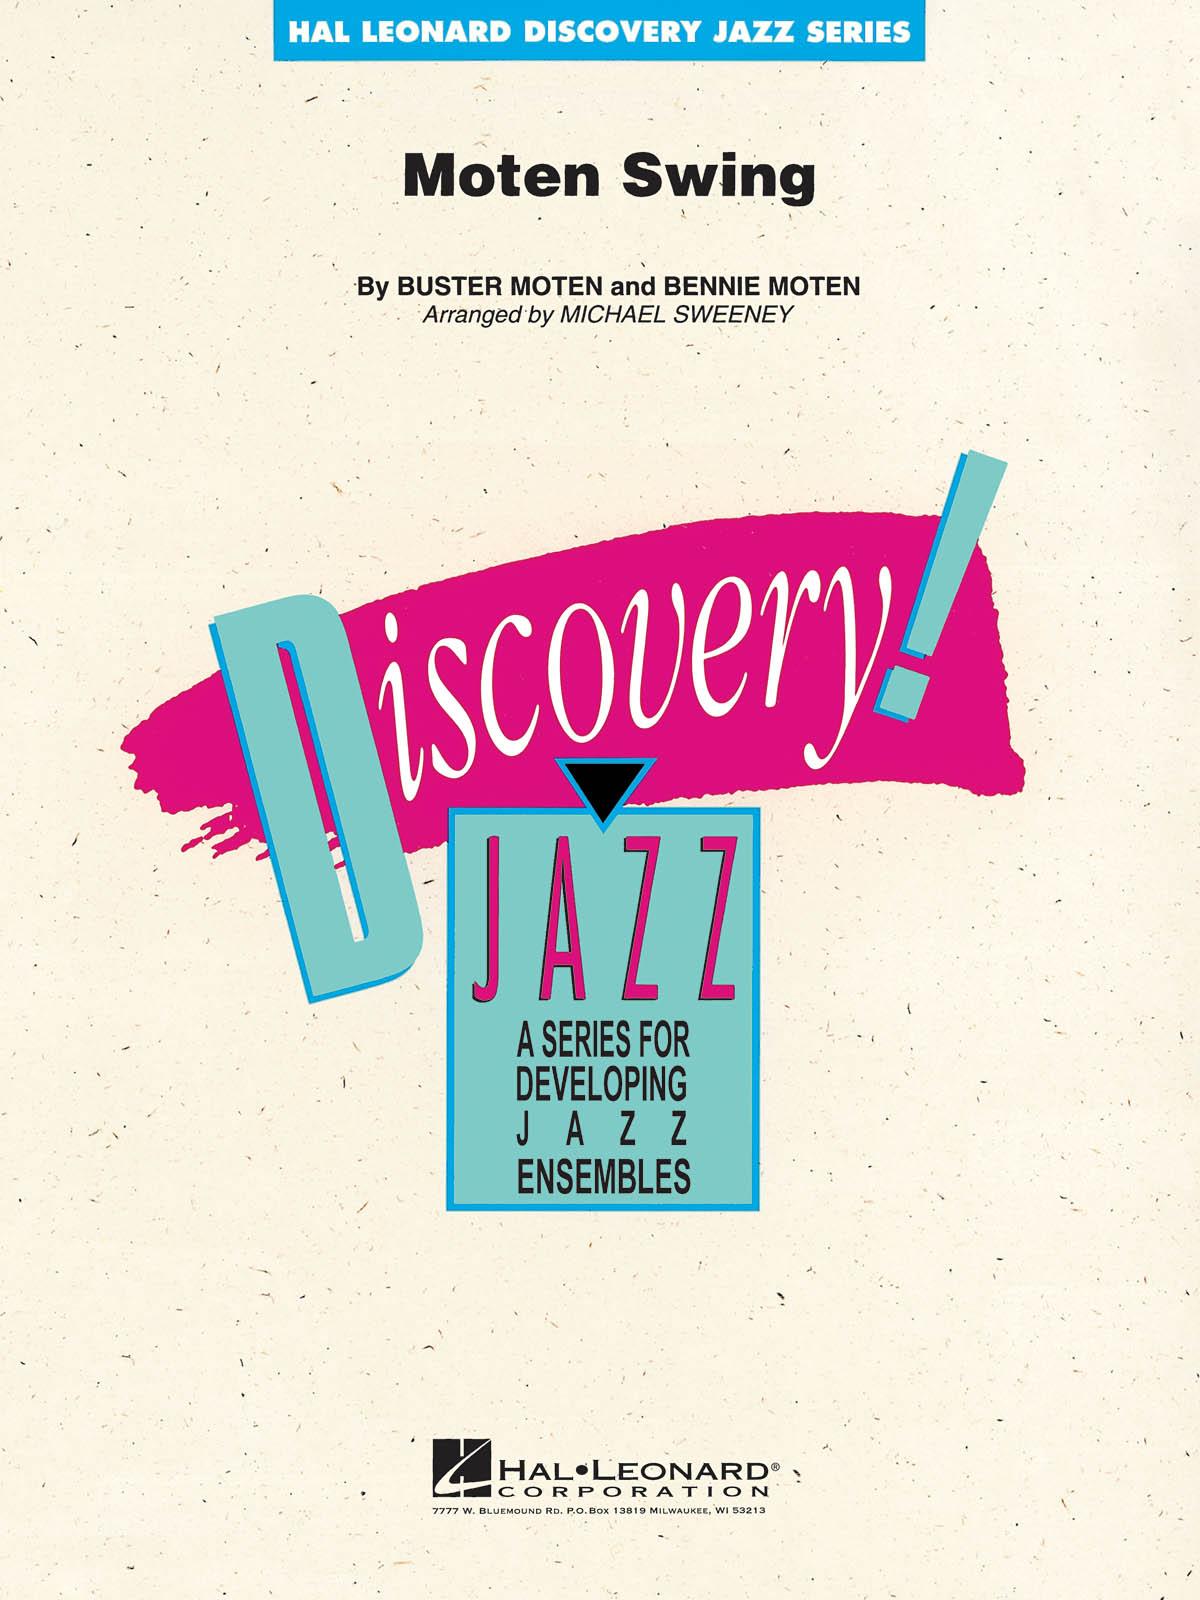 Moten Swing: Discovery Jazz